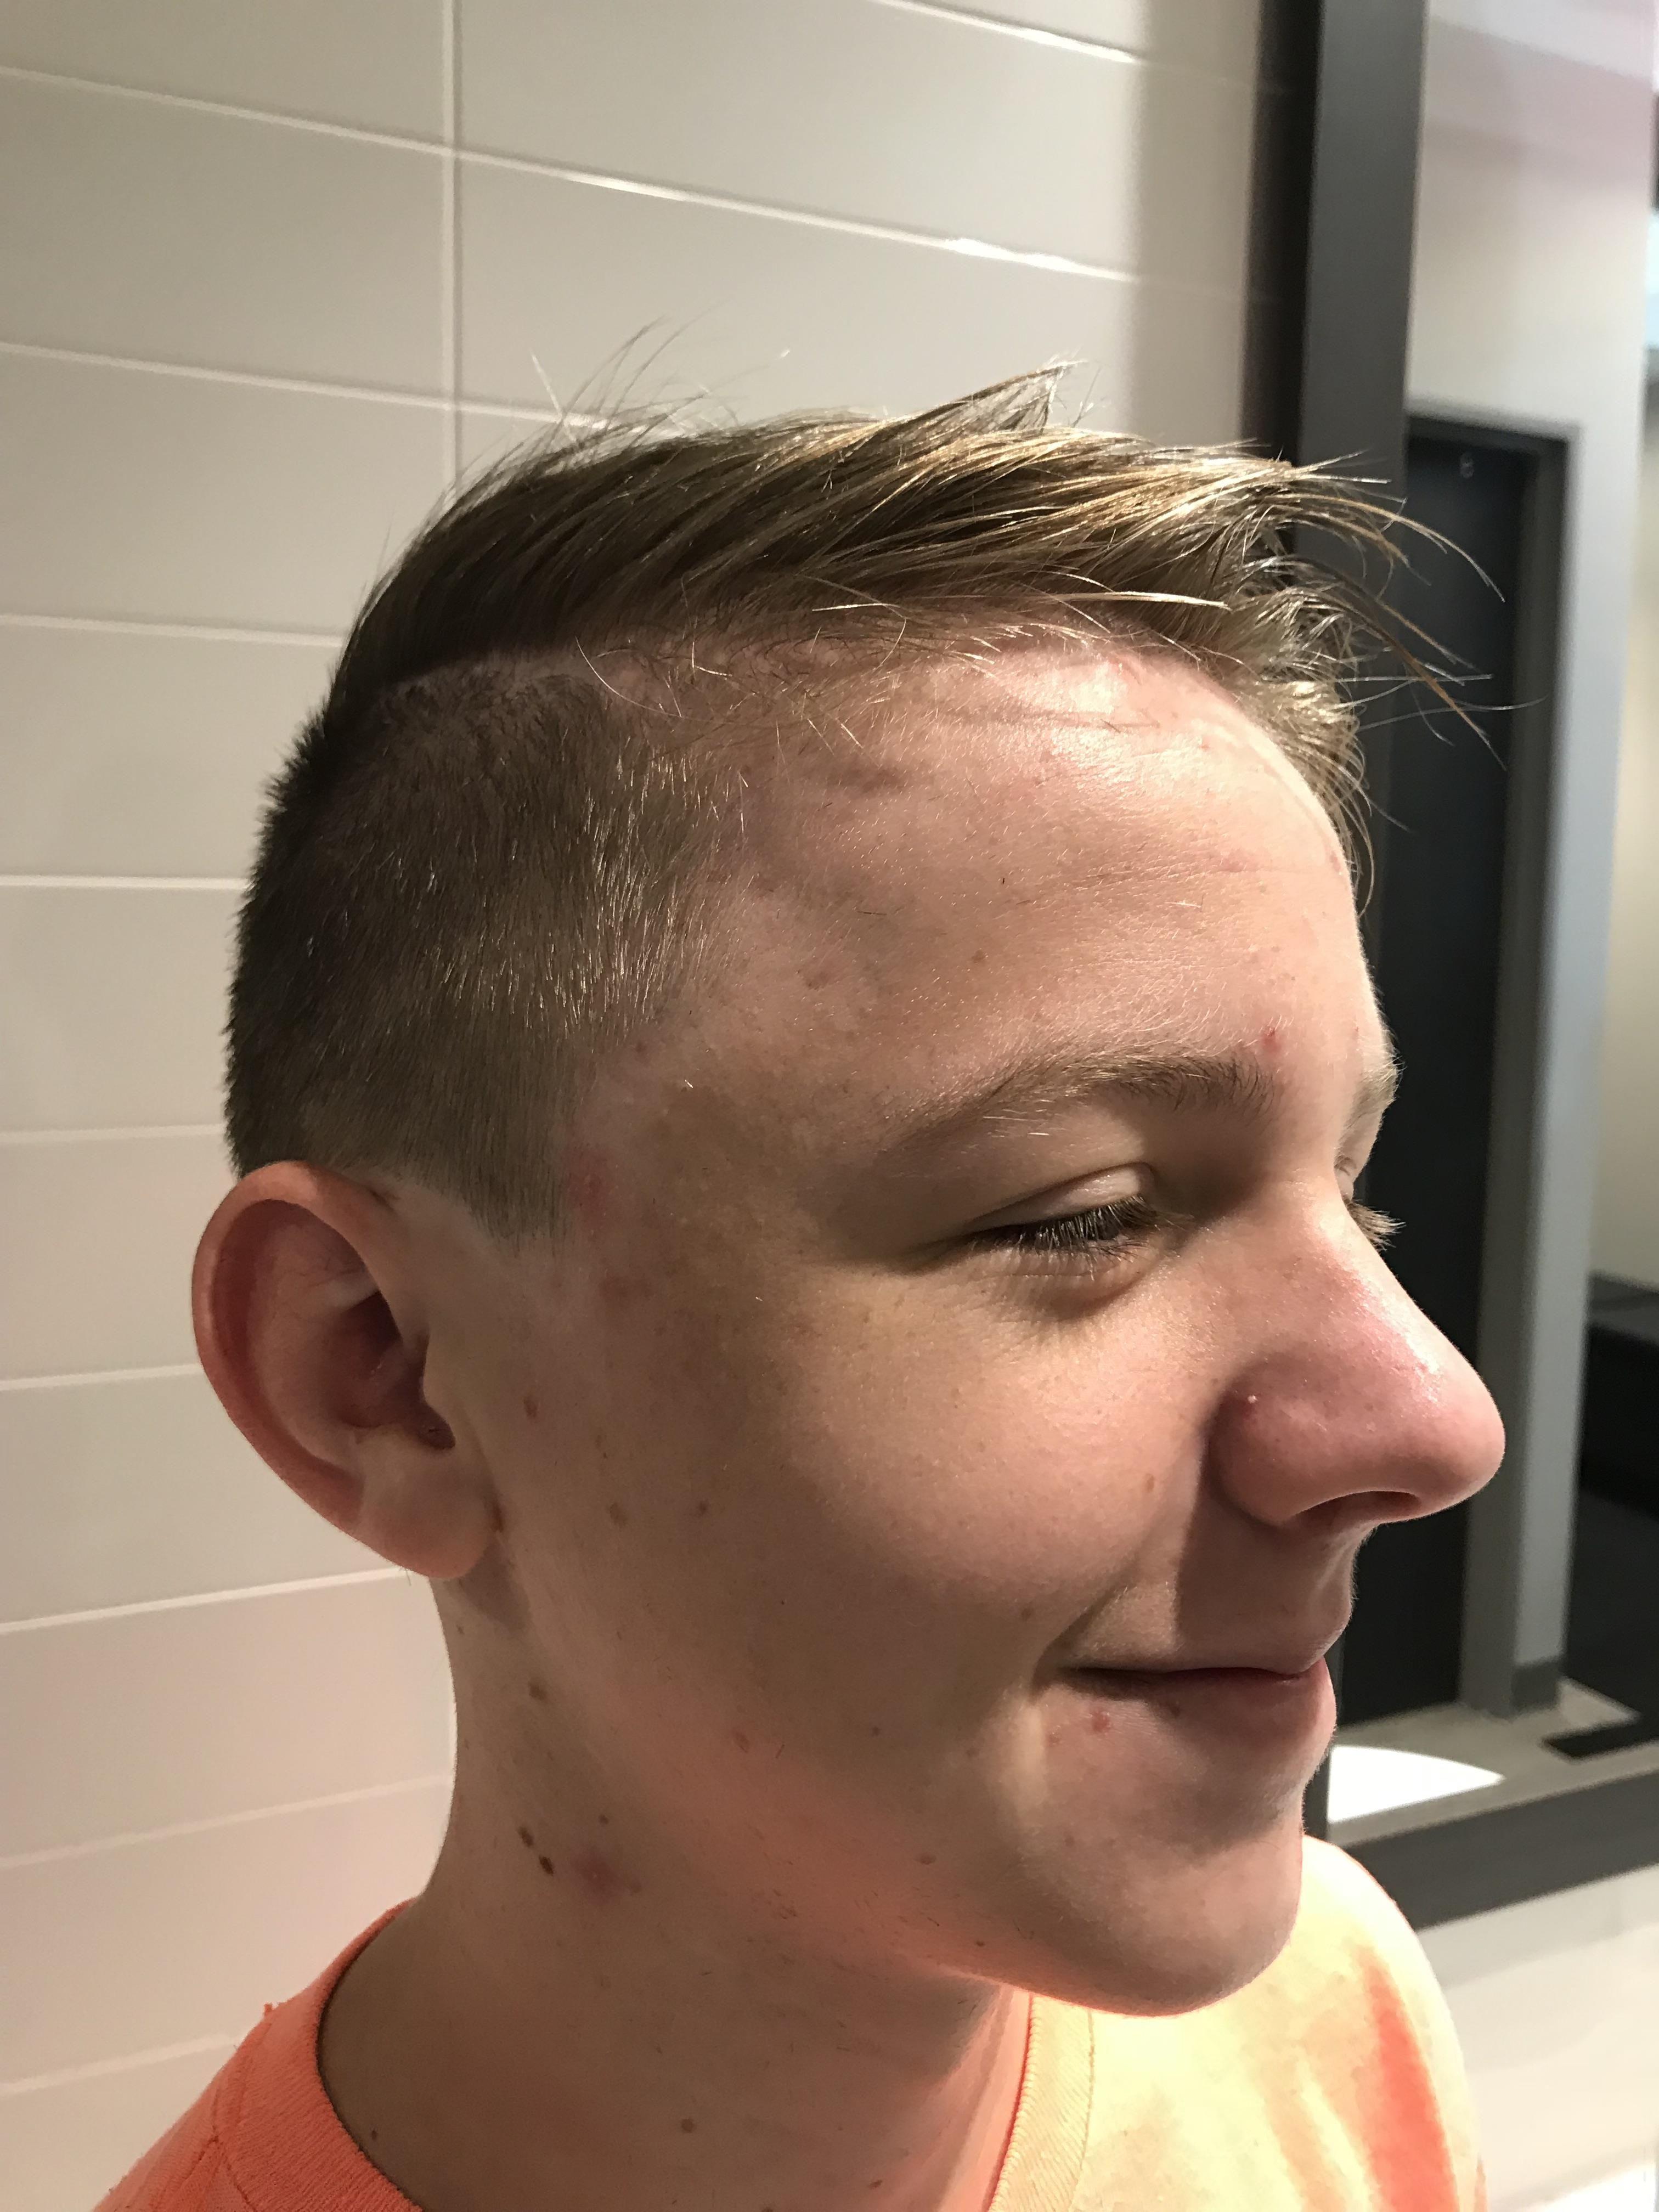 Mens Haircut 25 Boys To Men All About The School Cut Hair Cuts